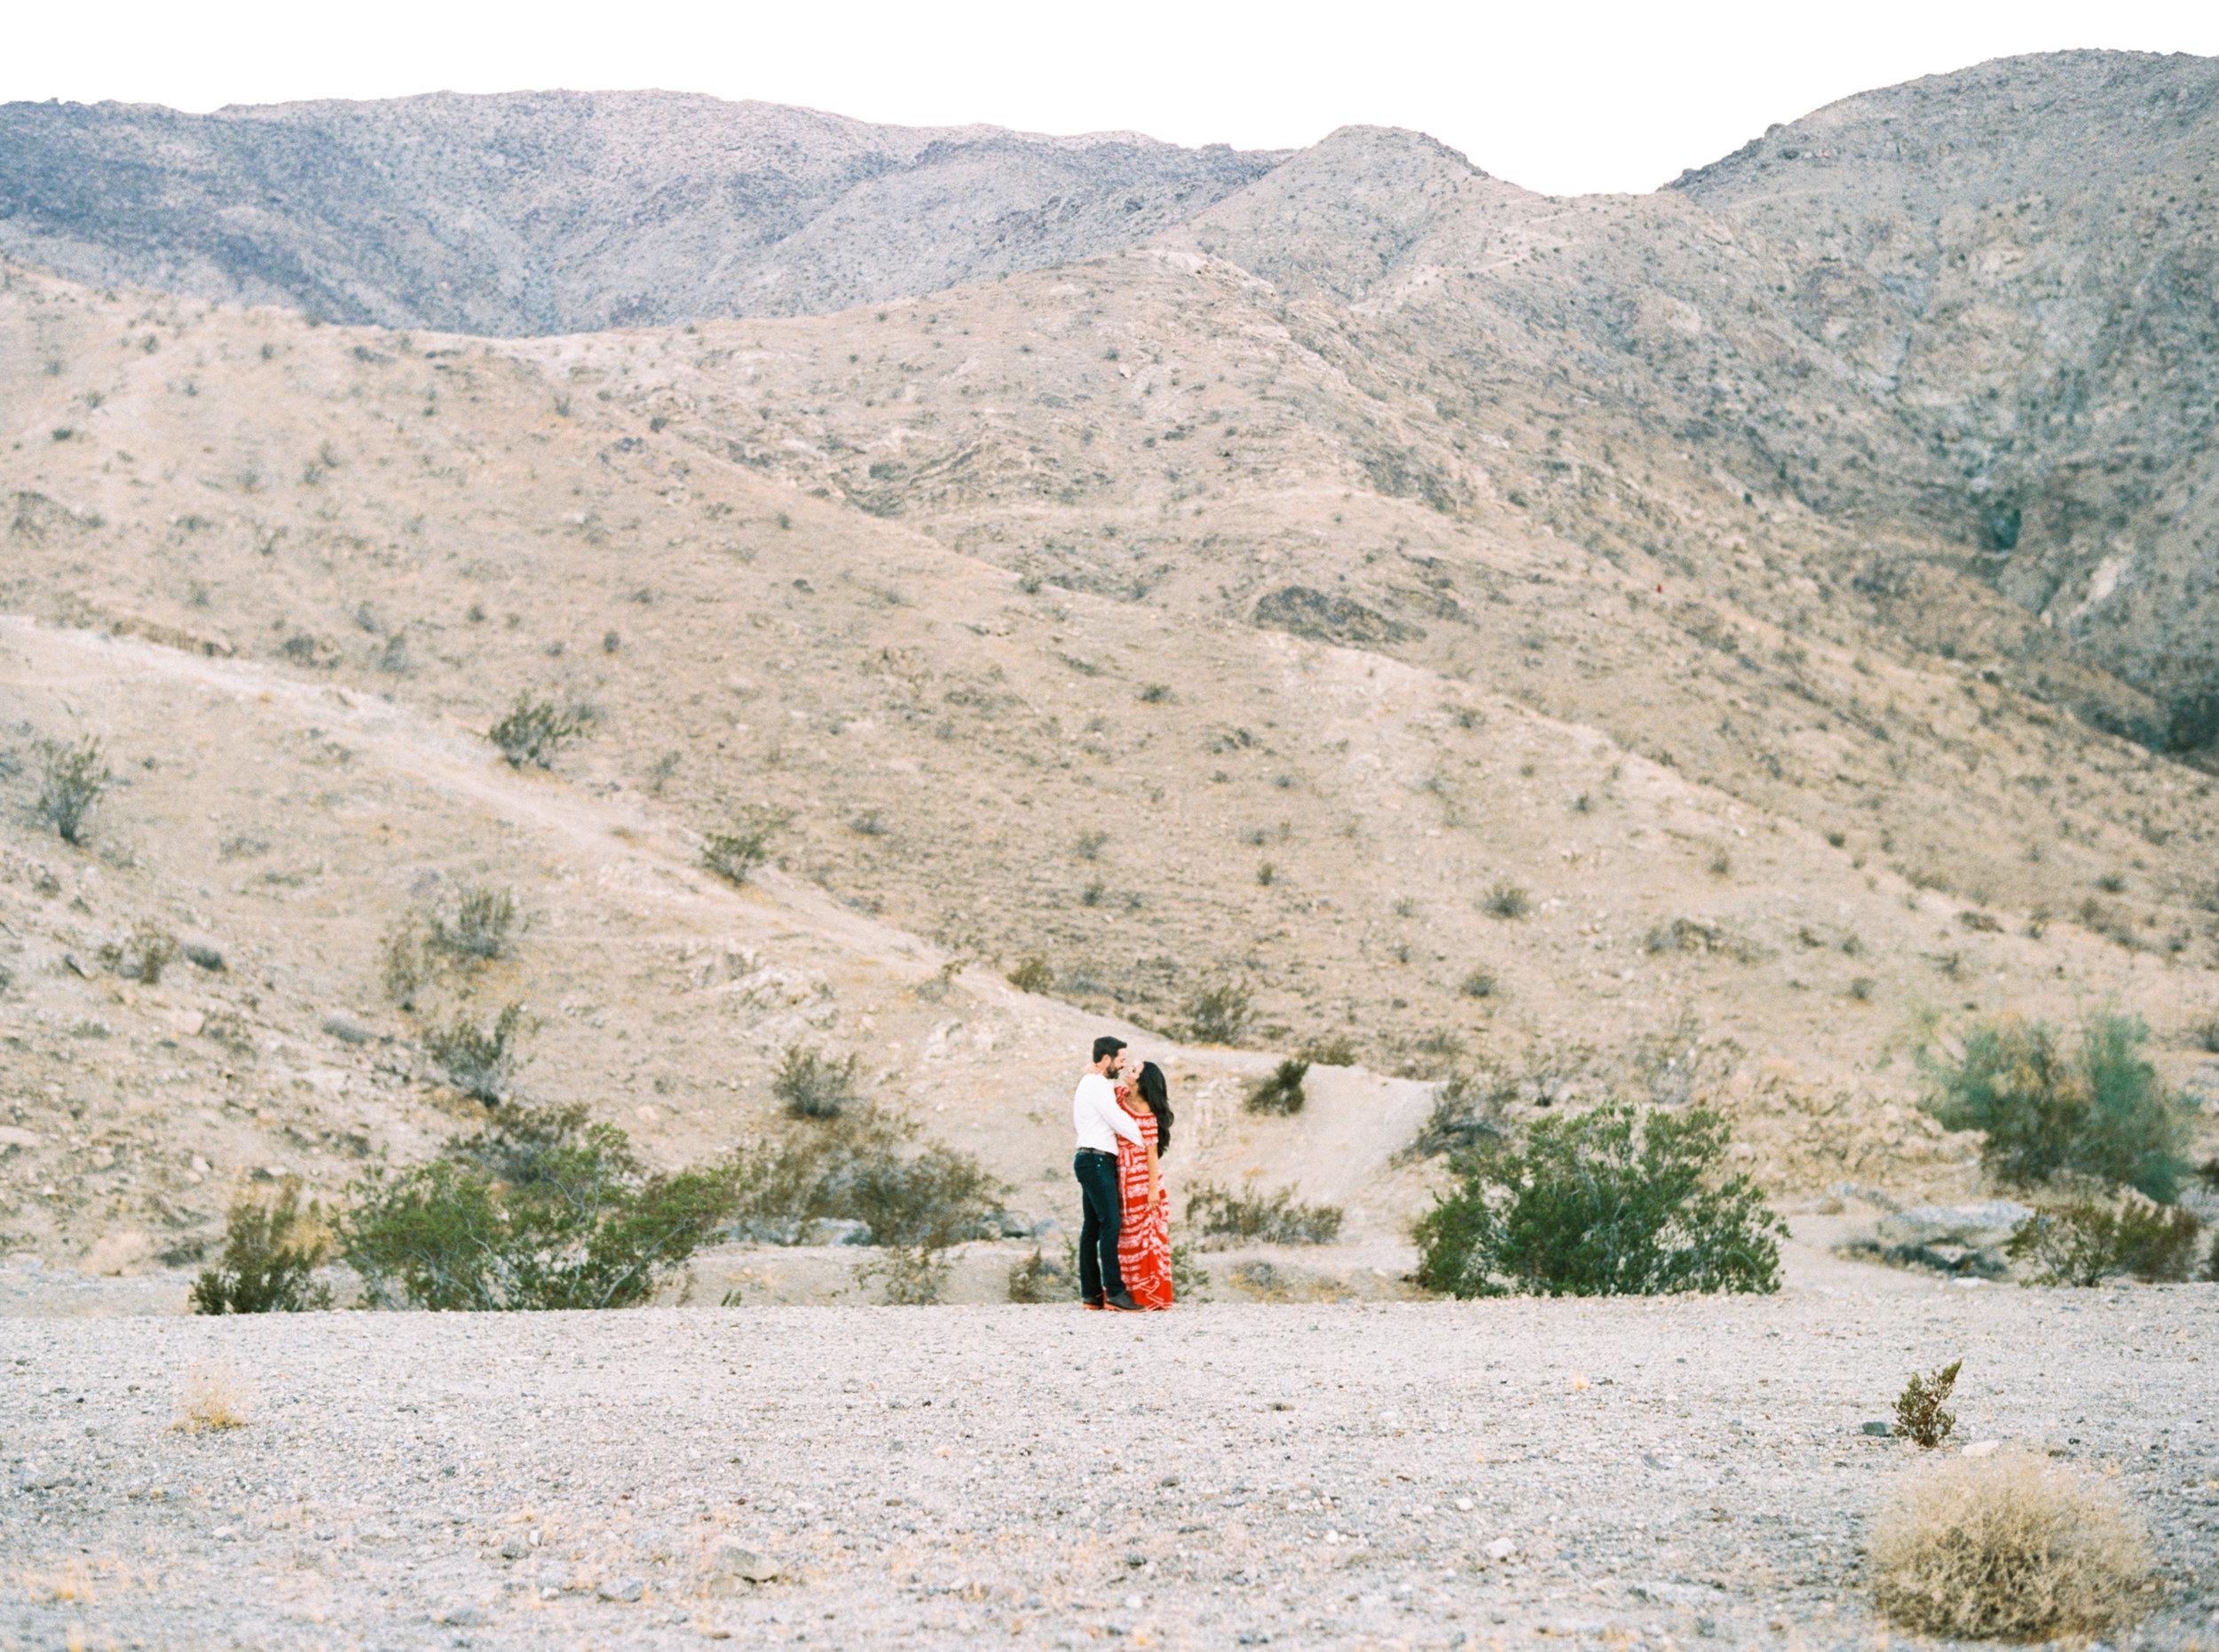 Palm Sprinsg Wedding Photographer Jenny Losee (29 of 32).jpg